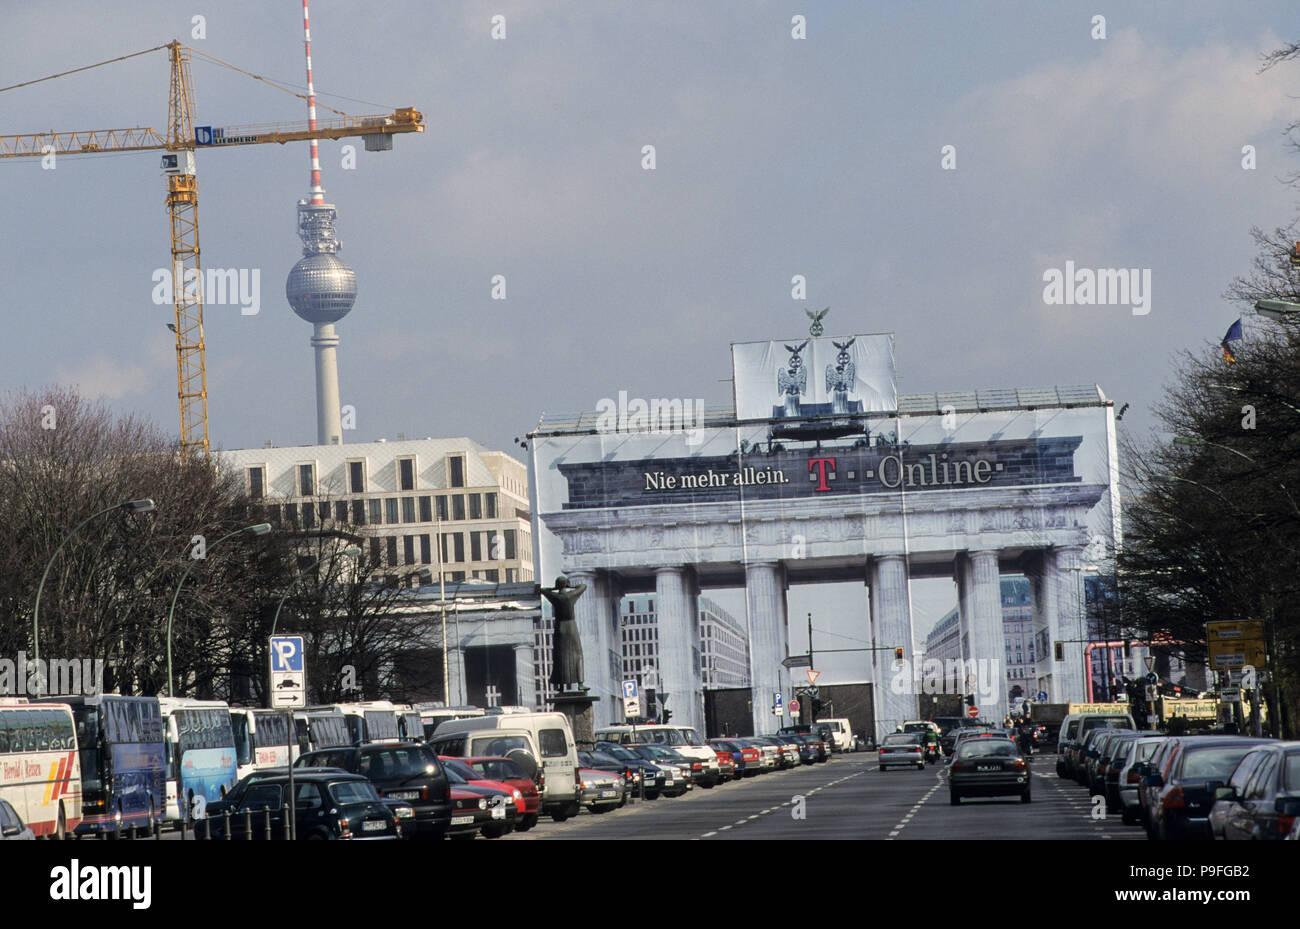 Germany Berlin Brandenburg Gate With Sculpture Quadriga The Roman Goddess Victoria Is Riding A Horse Powered